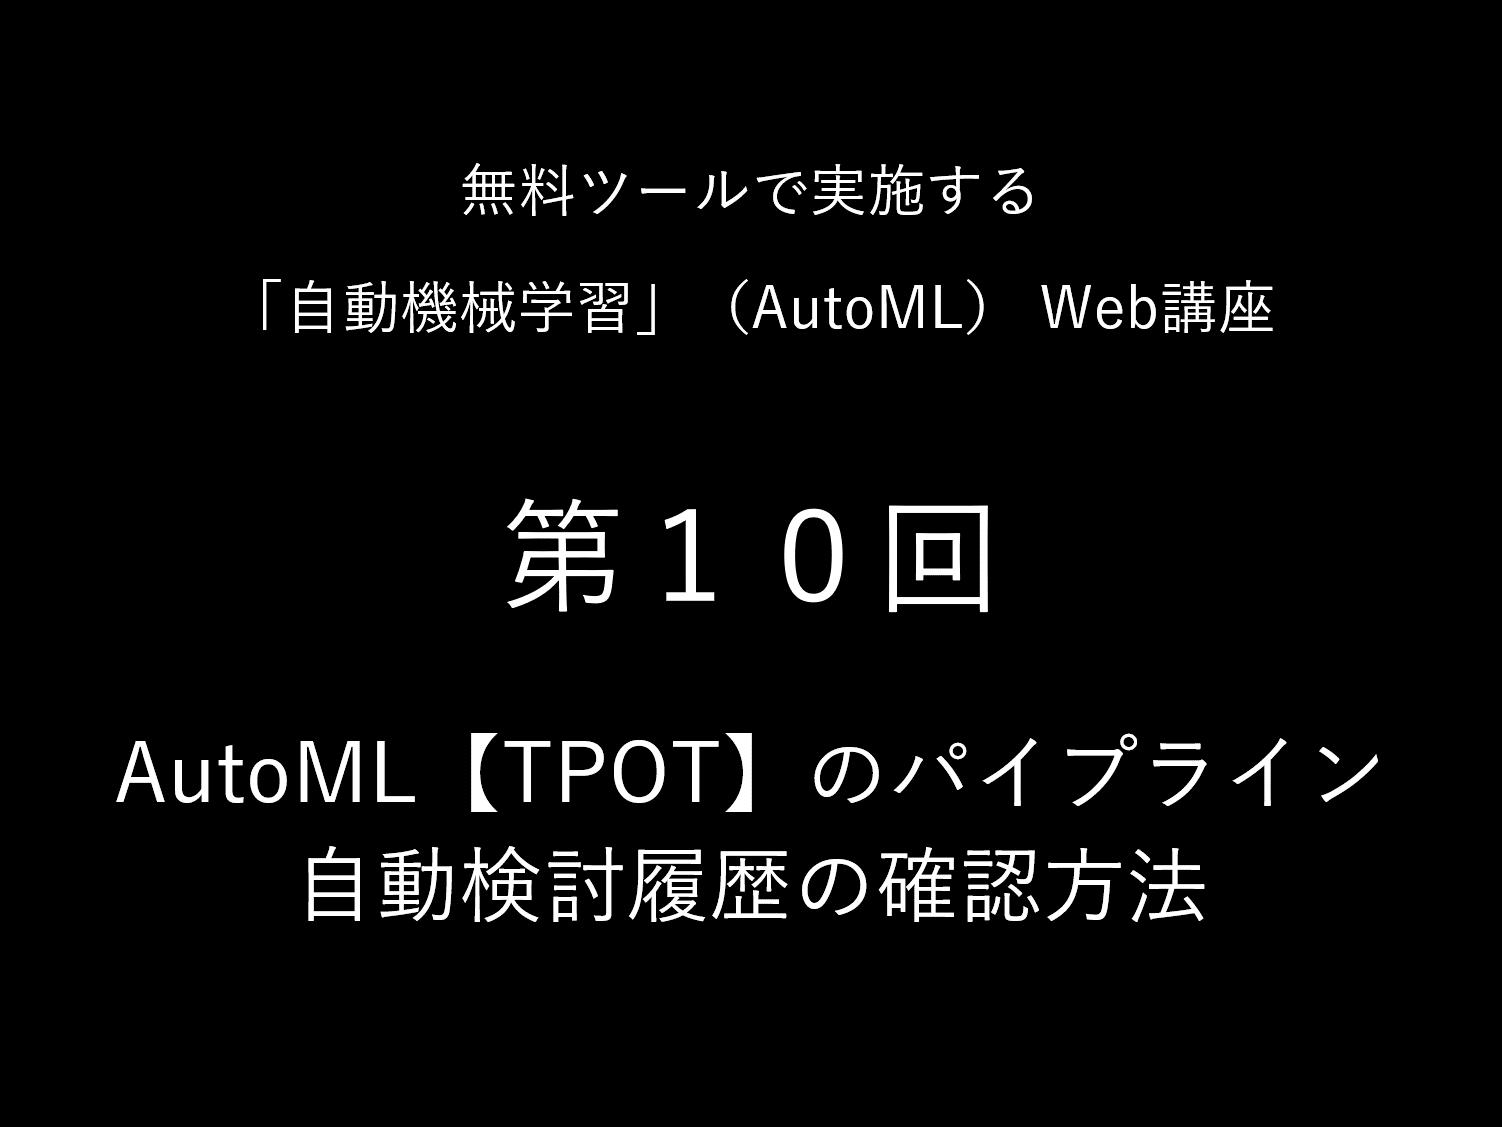 AutoML【TPOT】<br>パイプライン(変換器と予測器の組み合わせ)<br>自動検討履歴の確認方法